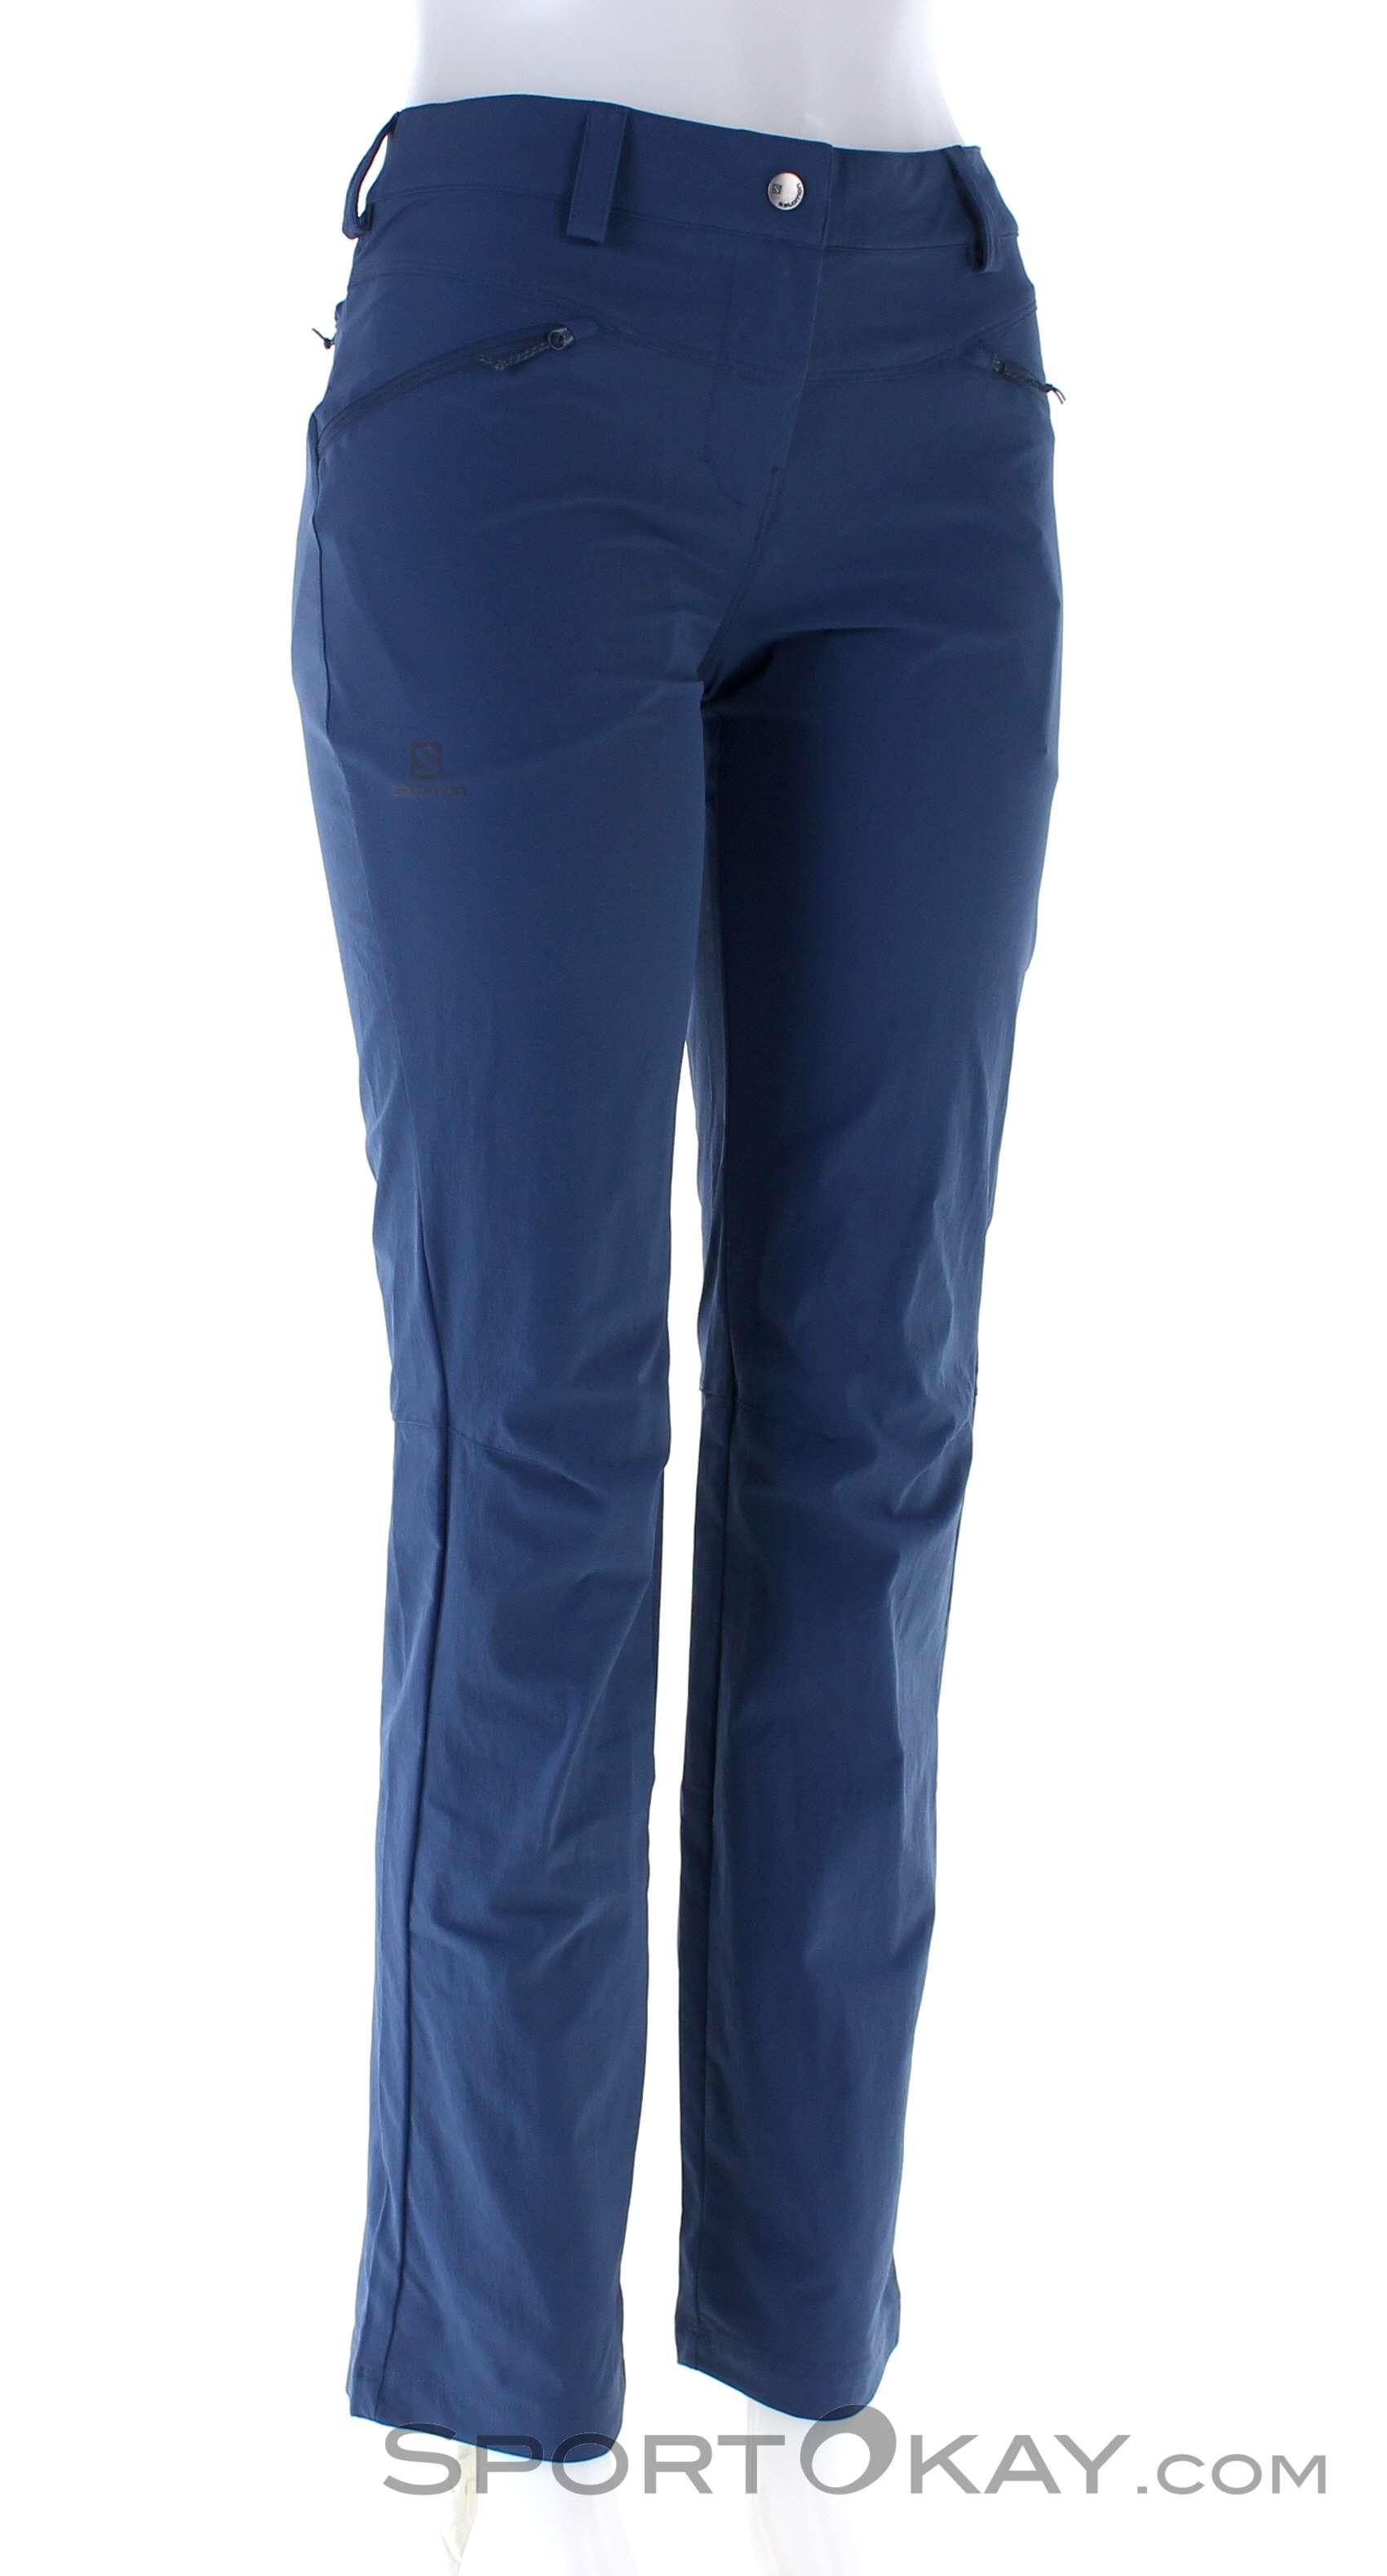 Salomon Salomon Wayfarer Straight Pant LT Regular Damen Outdoorhose l6SkY